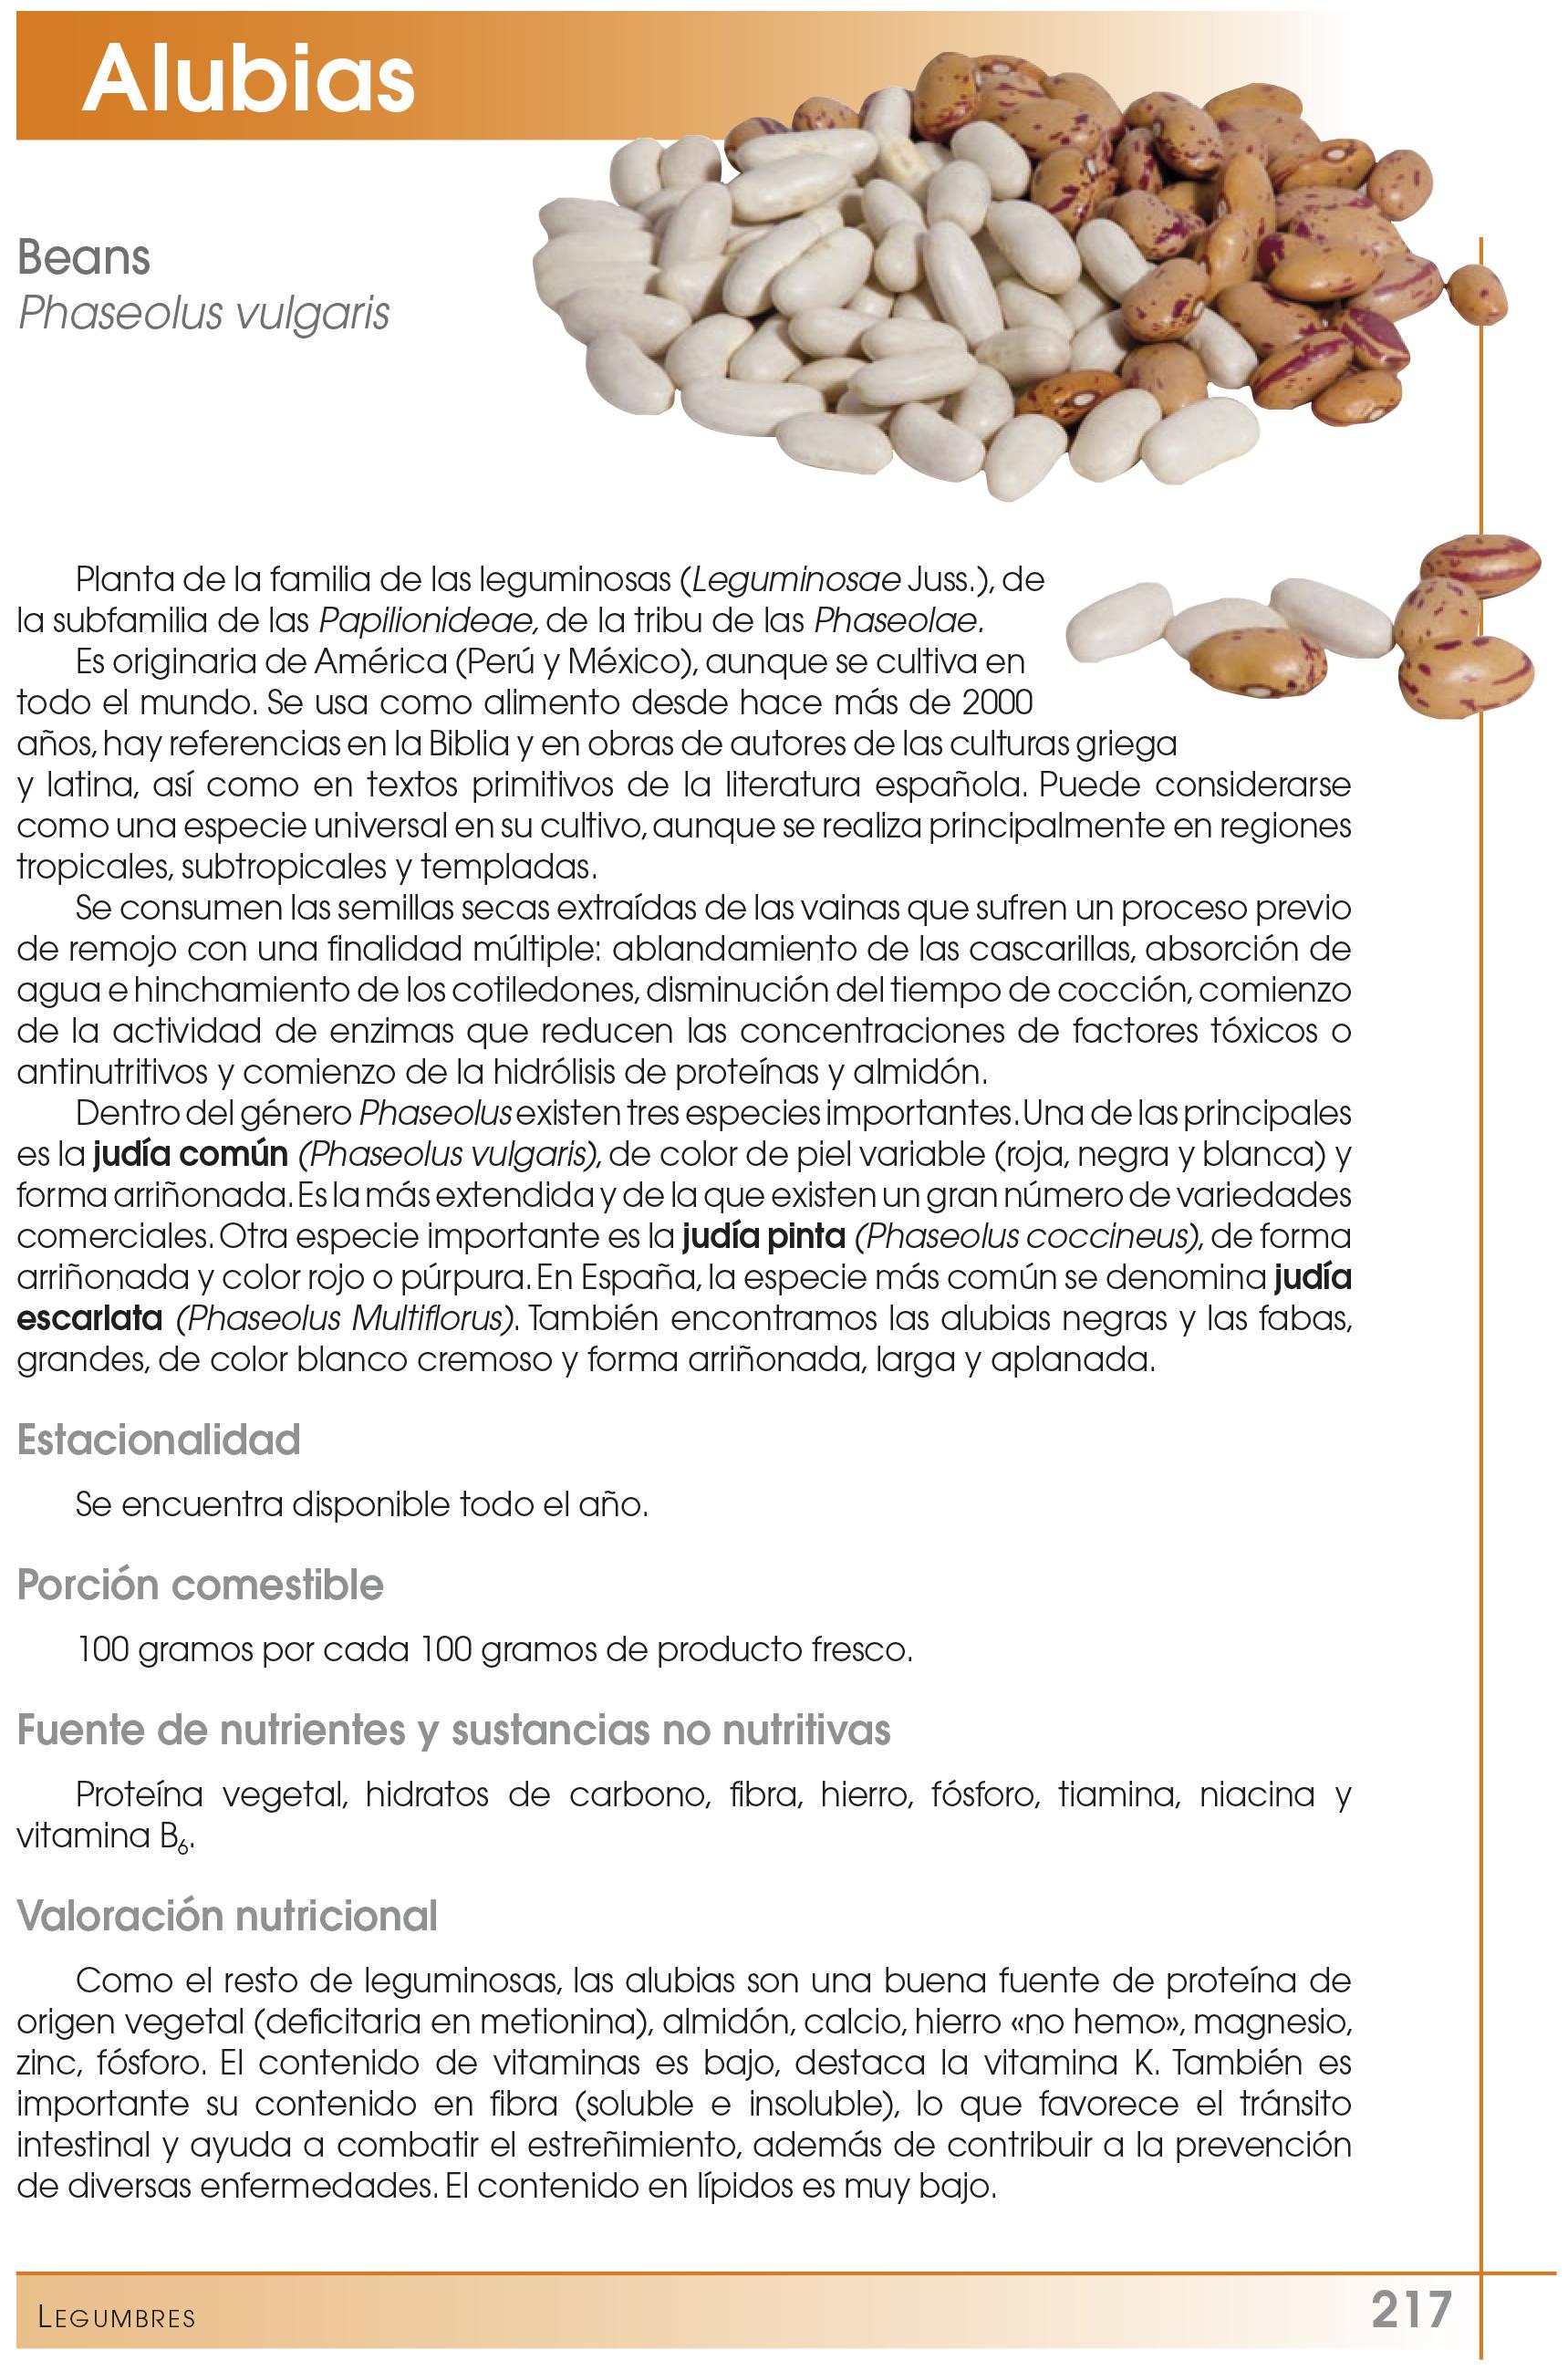 nutricional alubias